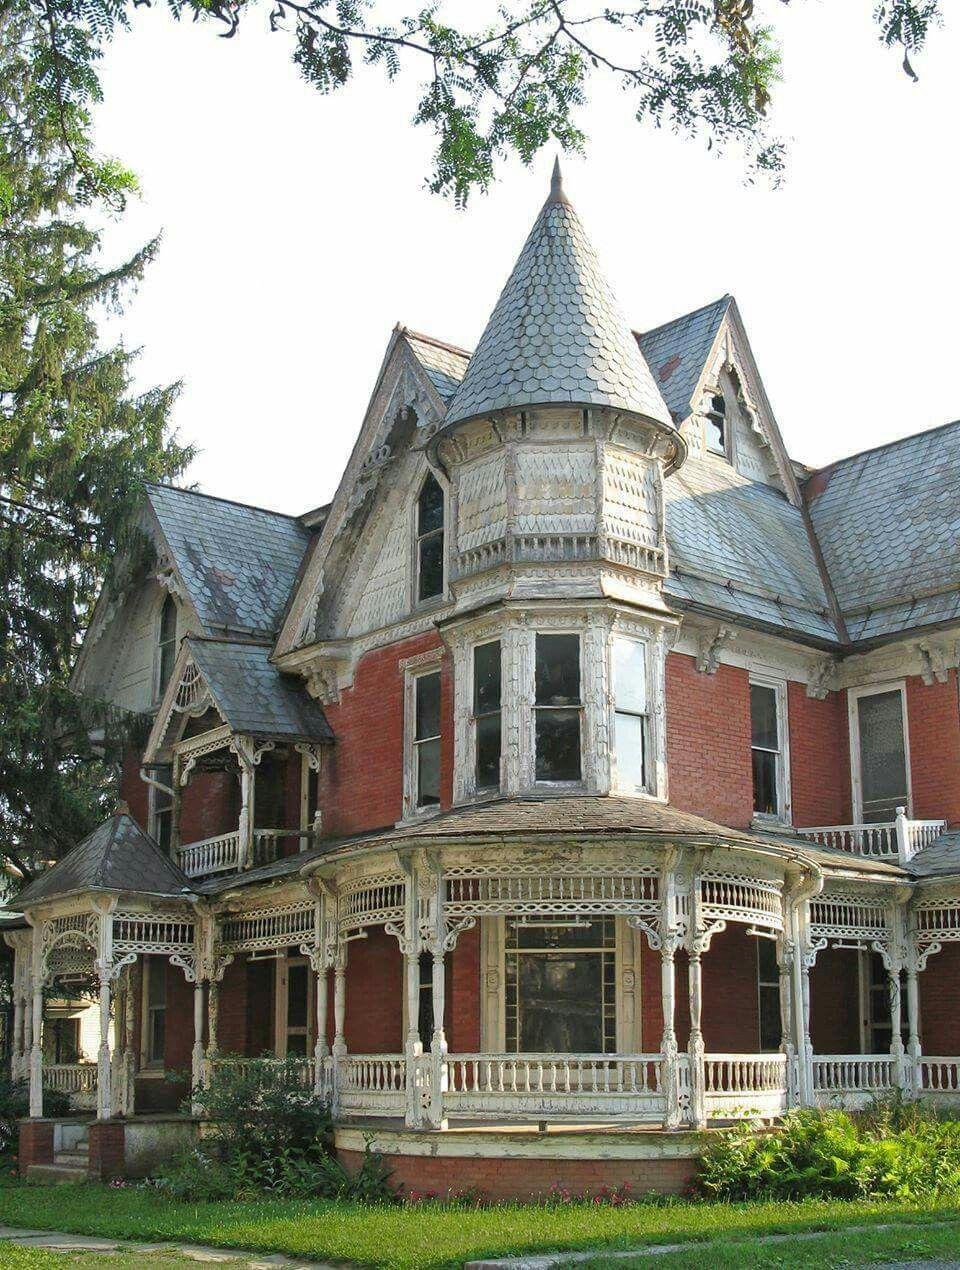 Looks Like A Home In Wichita Ks Victorian Homes Victorian Style Homes Victorian Architecture